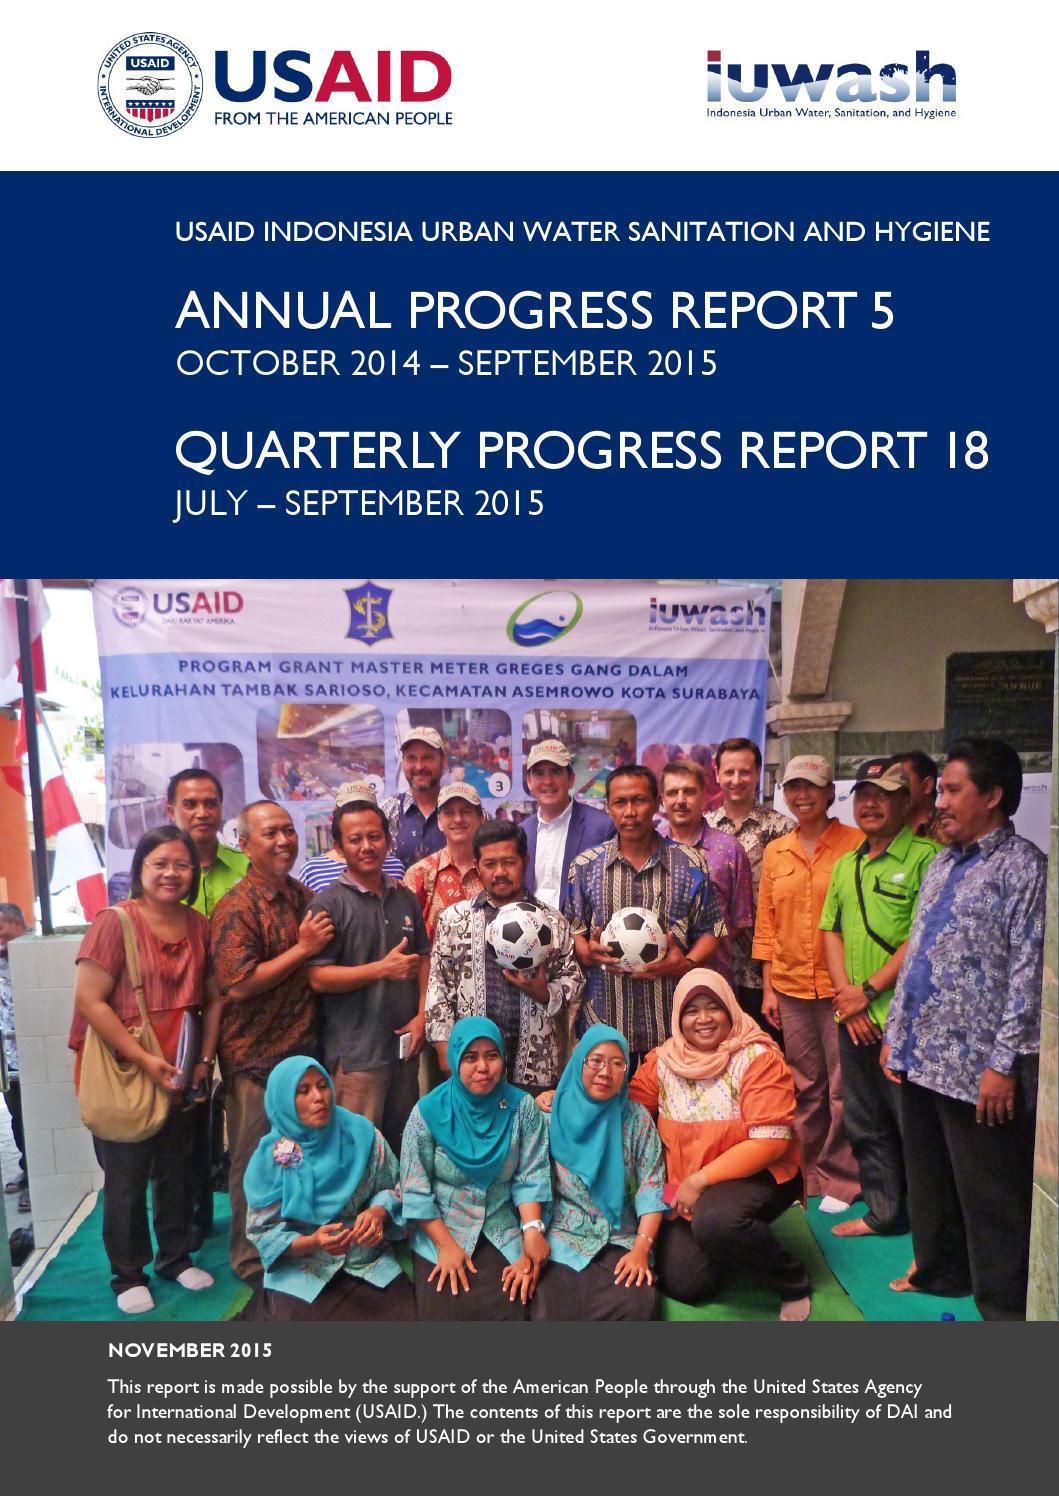 usaid iuwash annual progress report 5  oct 2014